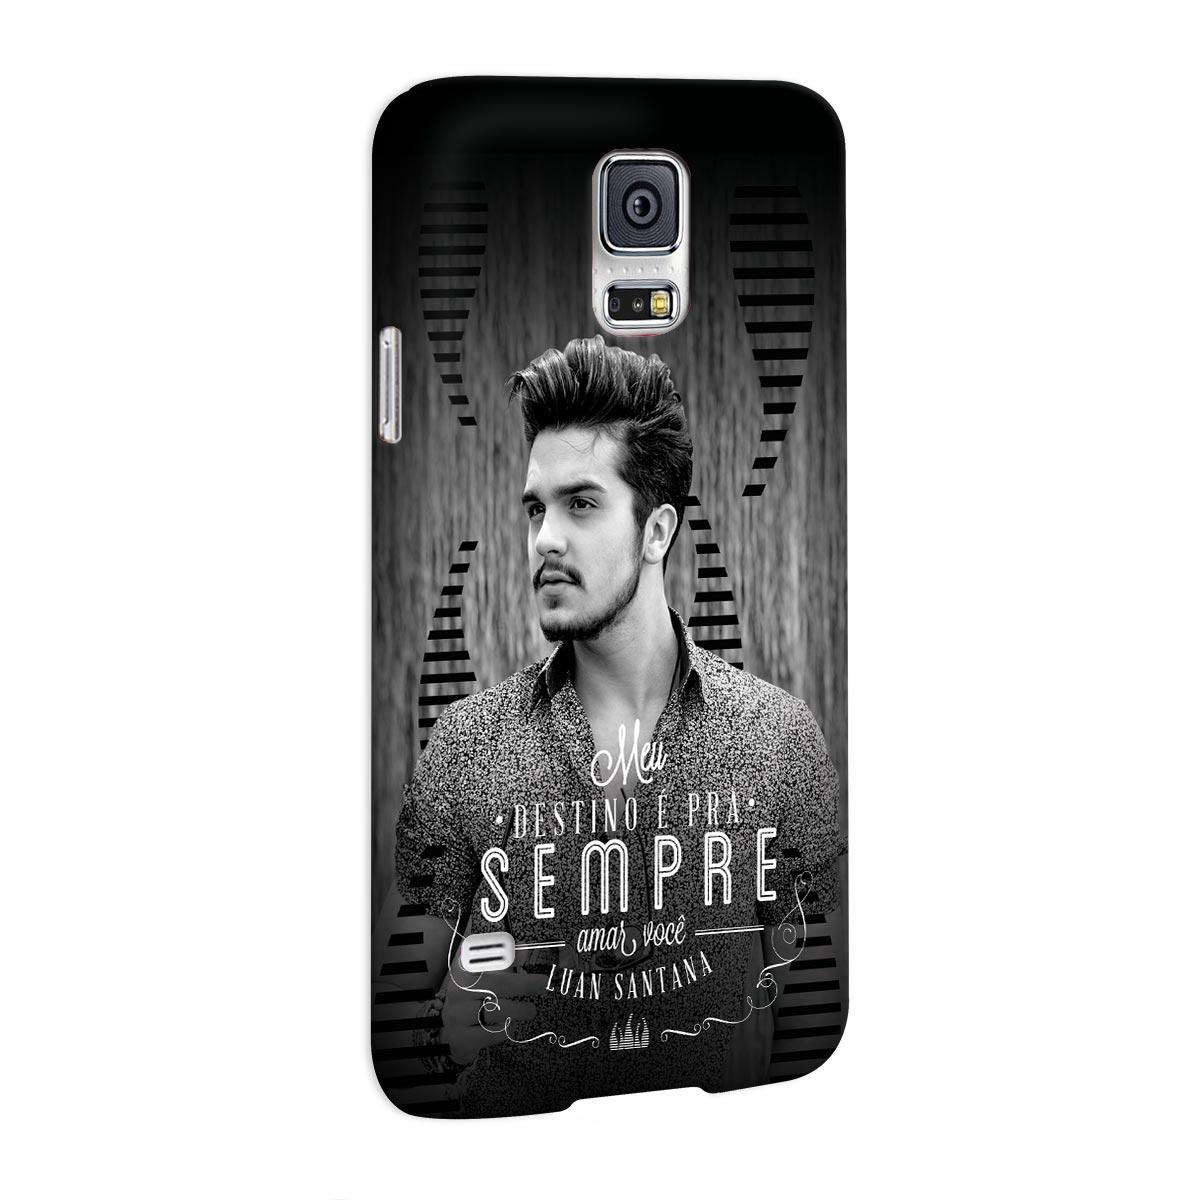 Capa para Samsung Galaxy S5 Luan Santana Meu Destino P&B